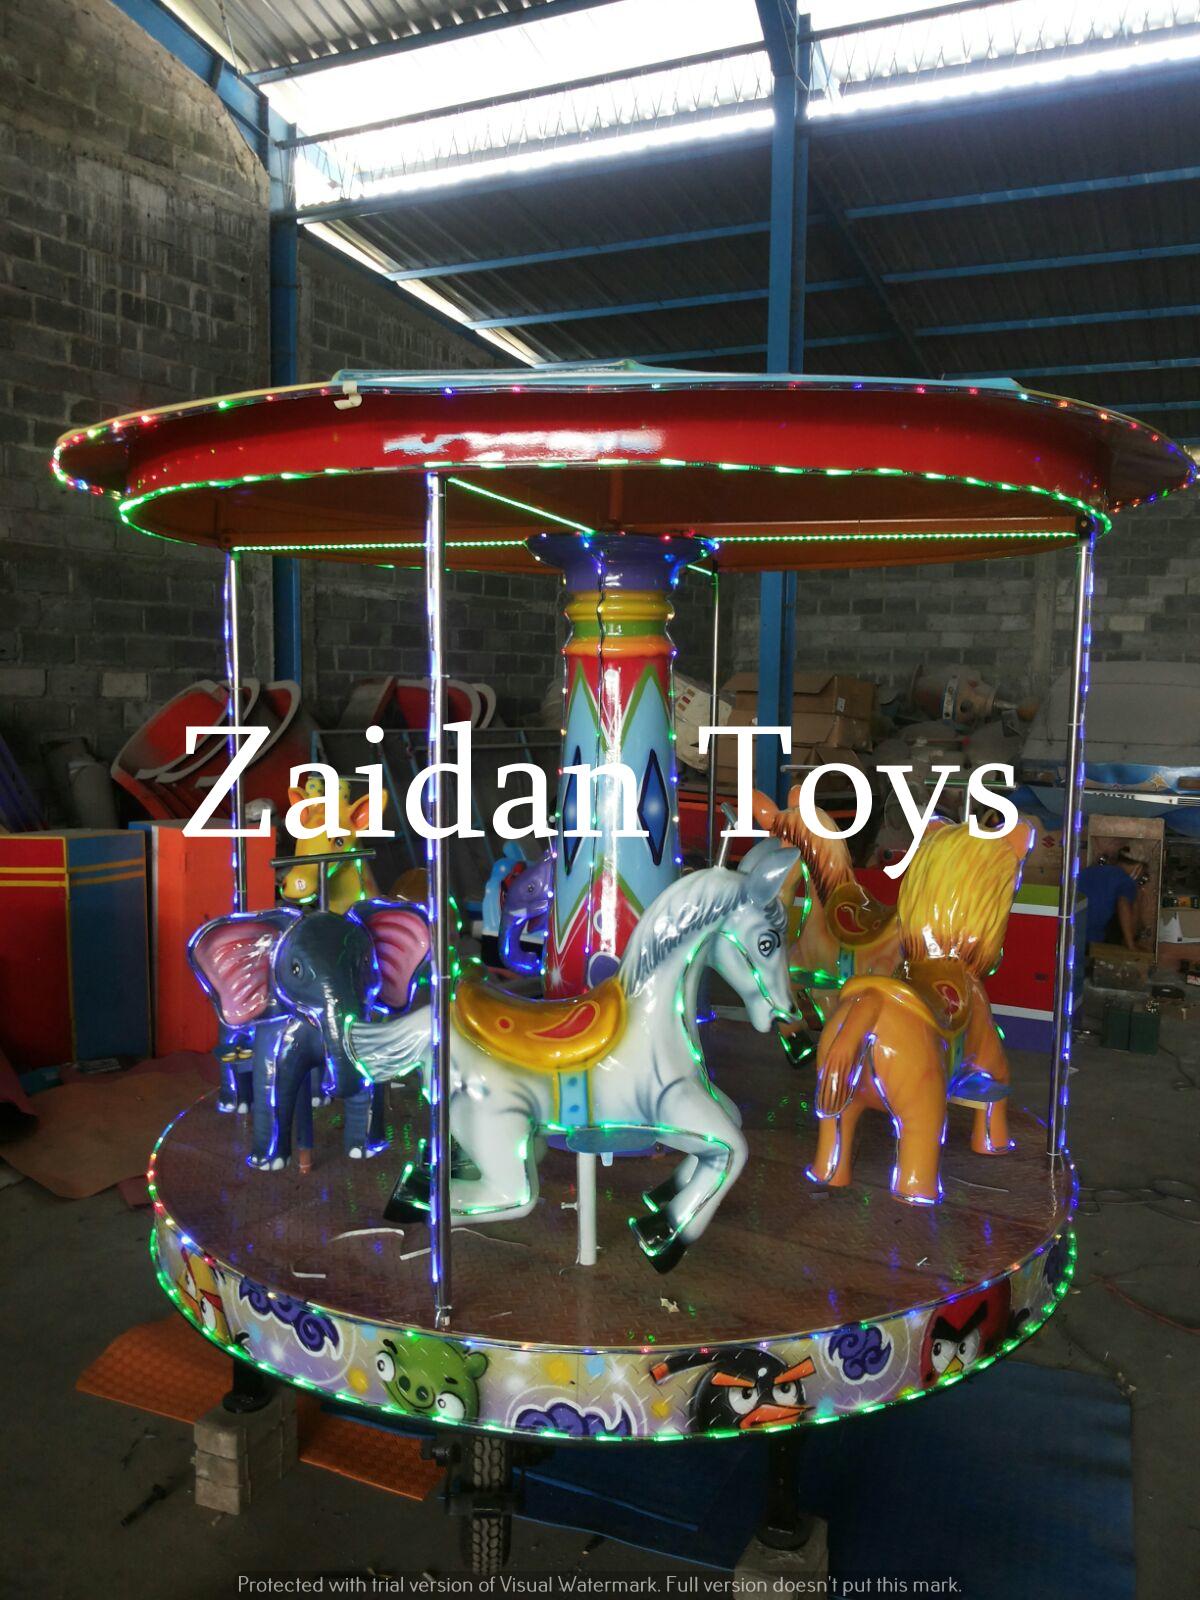 Pabrik mainan wisata anak terbaik dan terpercaya Surabaya menjual komedi putar carousel mini 6 penumpang harga murah dan berkualitas.